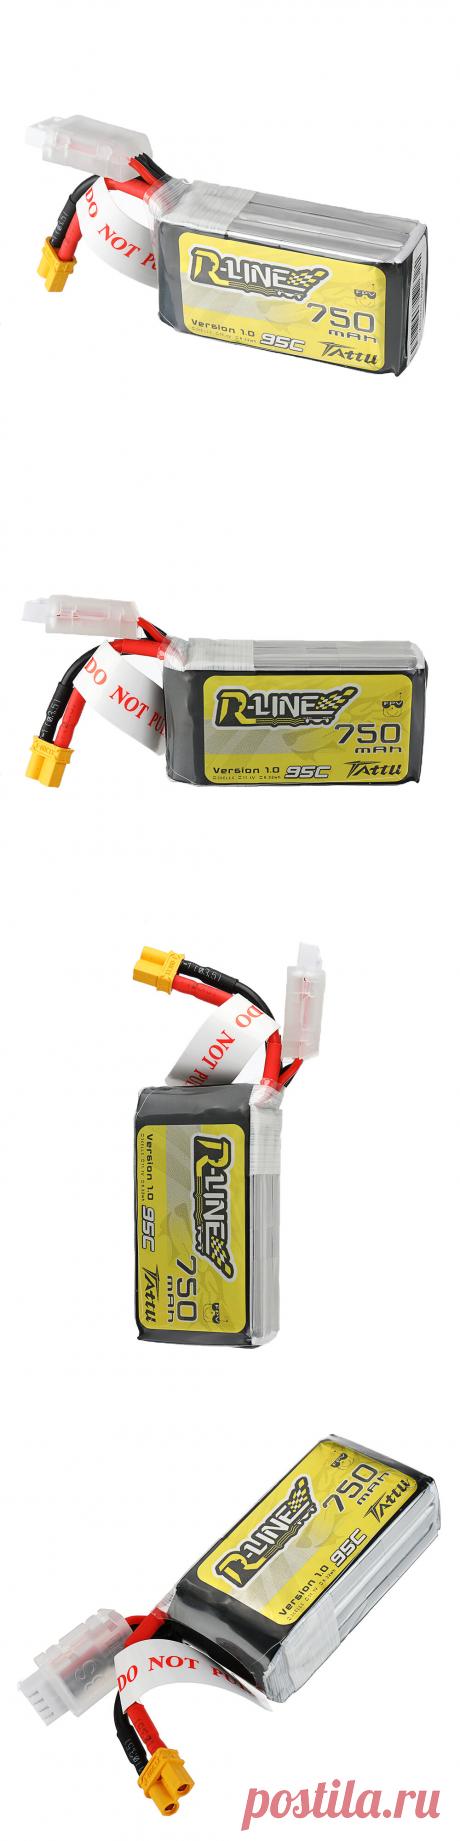 tattu r-line 1.0 11.1v 750mah 95c 3s lipo battery xt30 plug for eachine lizard95 fpv racer Sale - Banggood.com